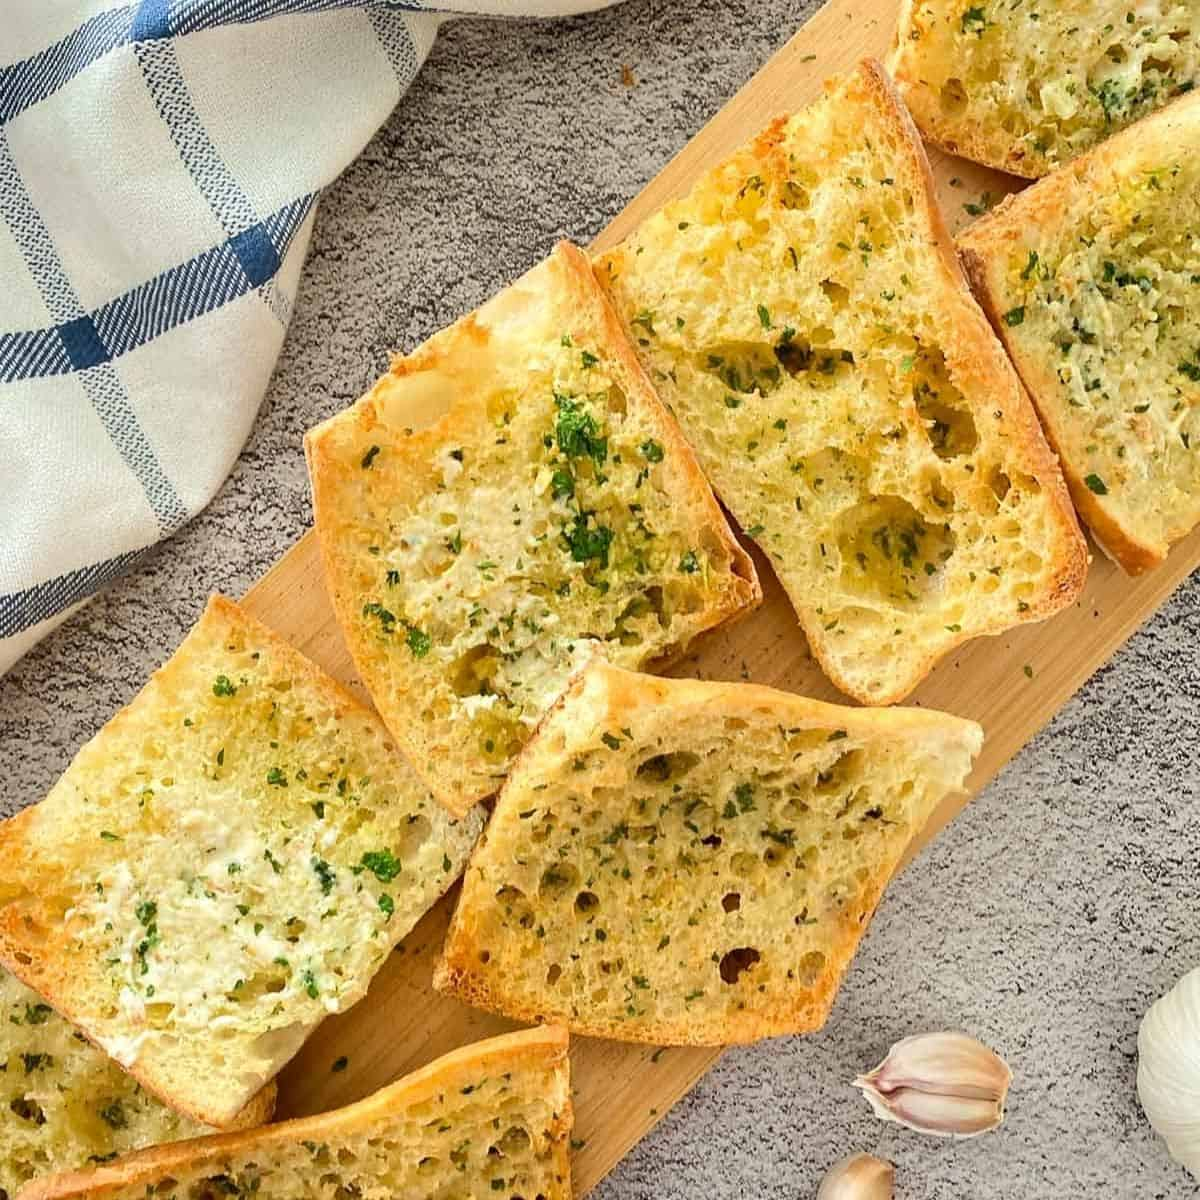 Slices of garlic bread on wooden cutting board.